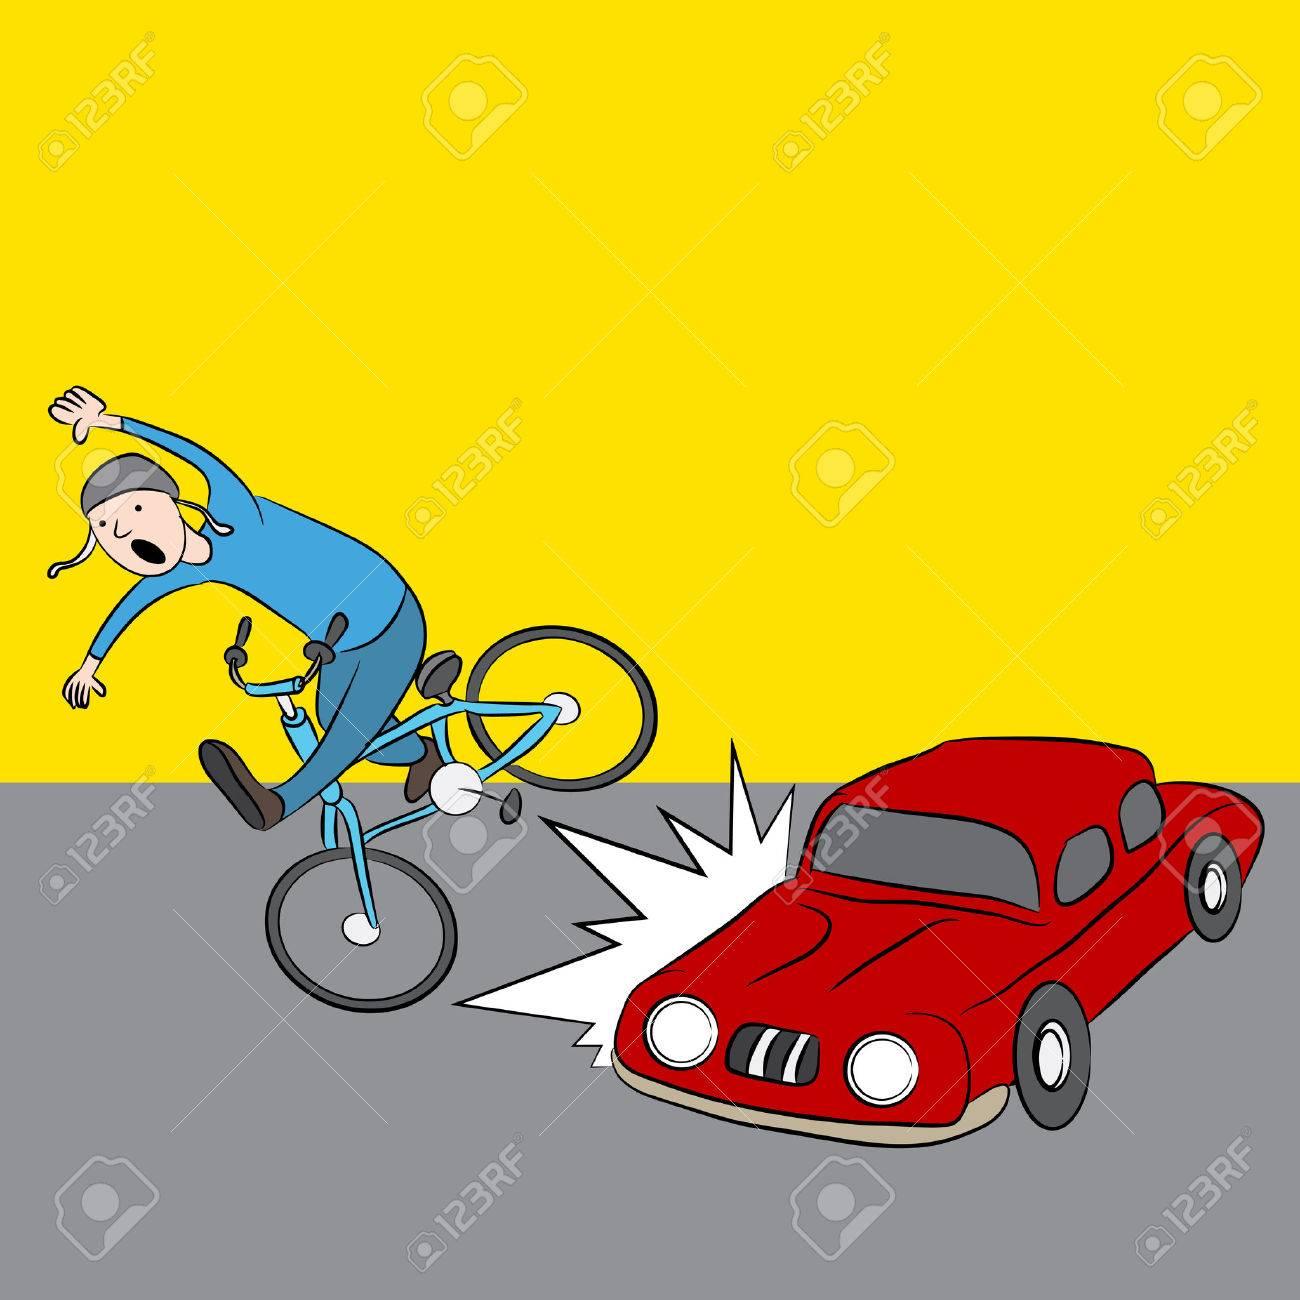 An Image Of A Cartoon Car Hitting A Pedestrian On A Bike